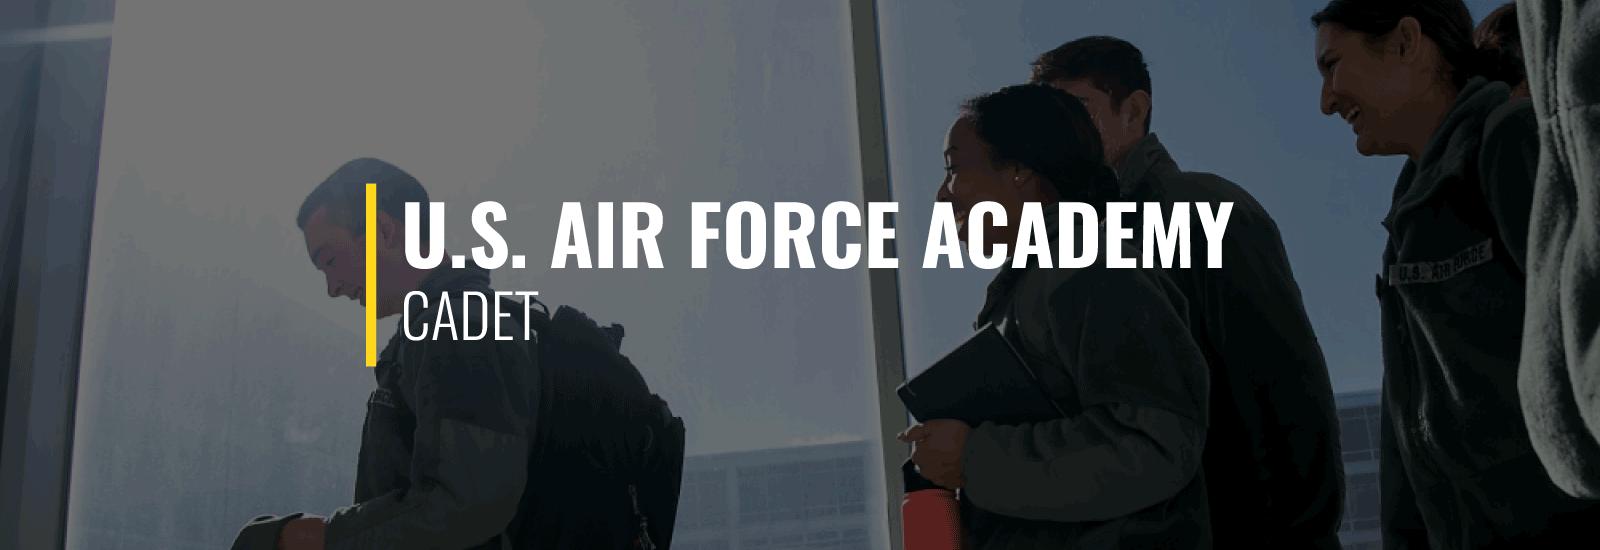 Air Force Academy Cadet